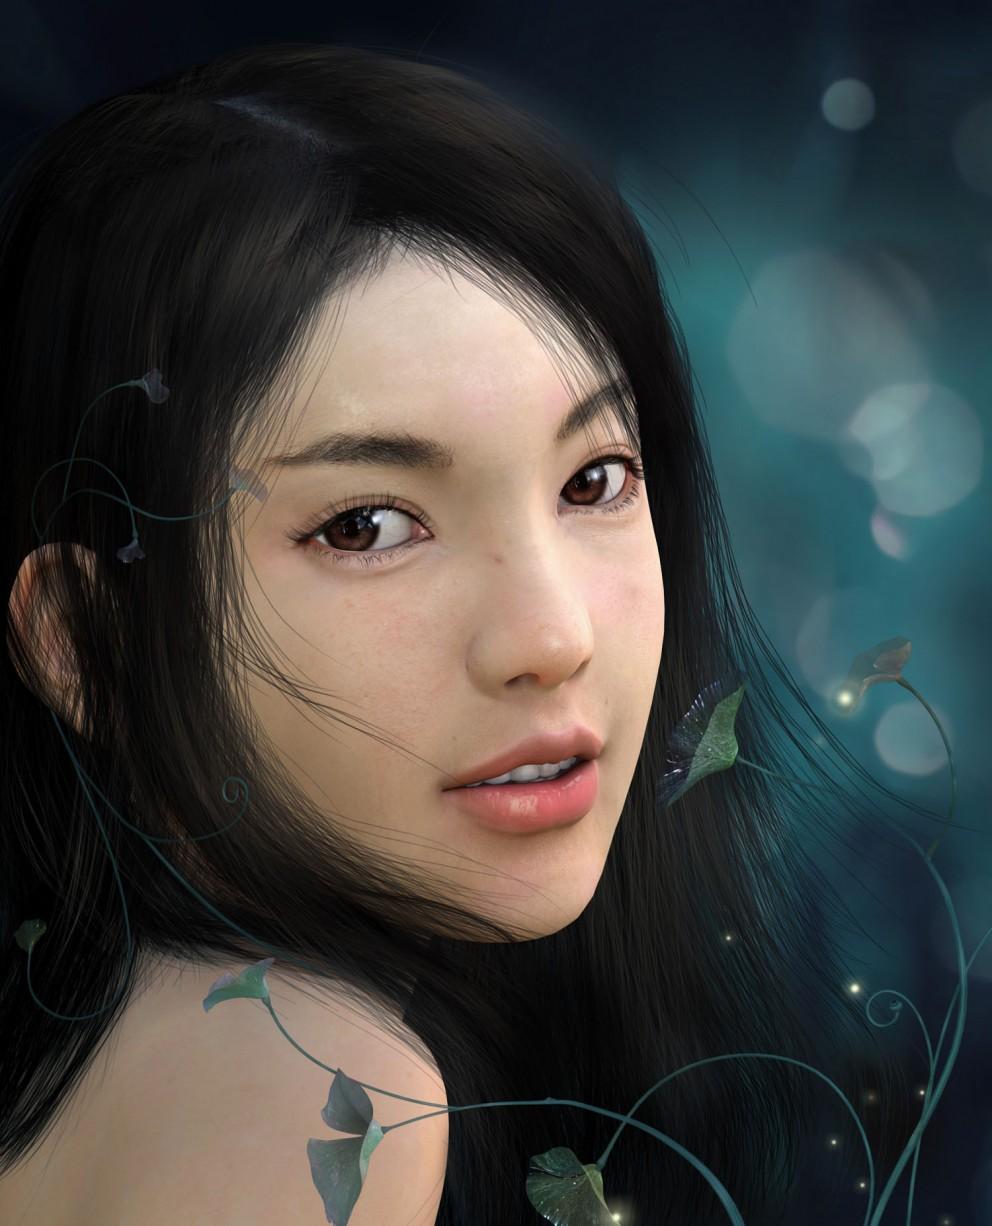 Pastel Beauty Art Cg Woman Asian Girl Ultra 3840x2160 Hd